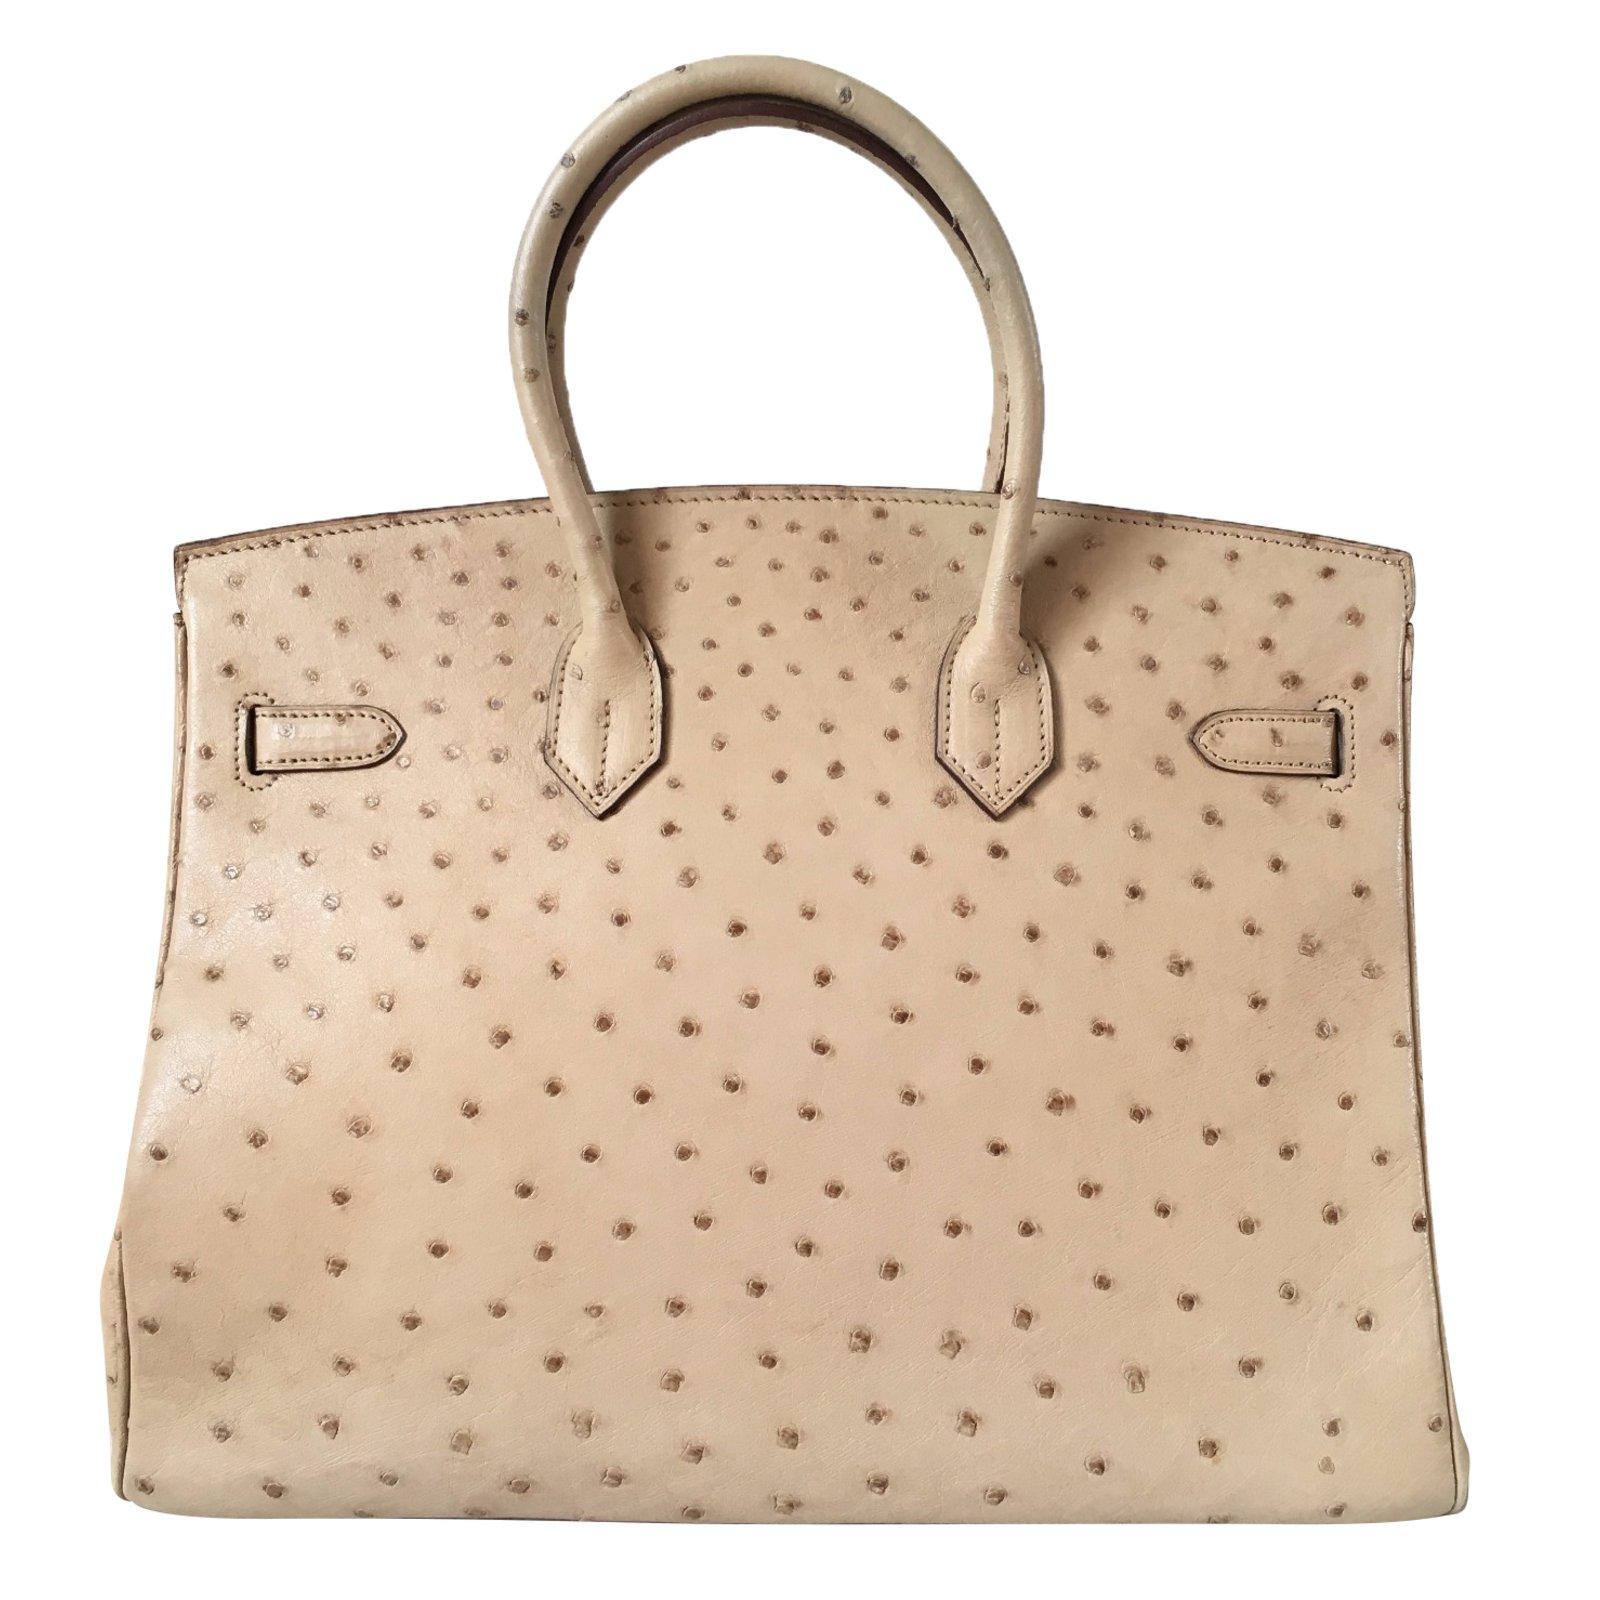 25a0beee8da Hermès Birkin 35 Ostrich Parchemin Gold hardware Handbags Exotic ...